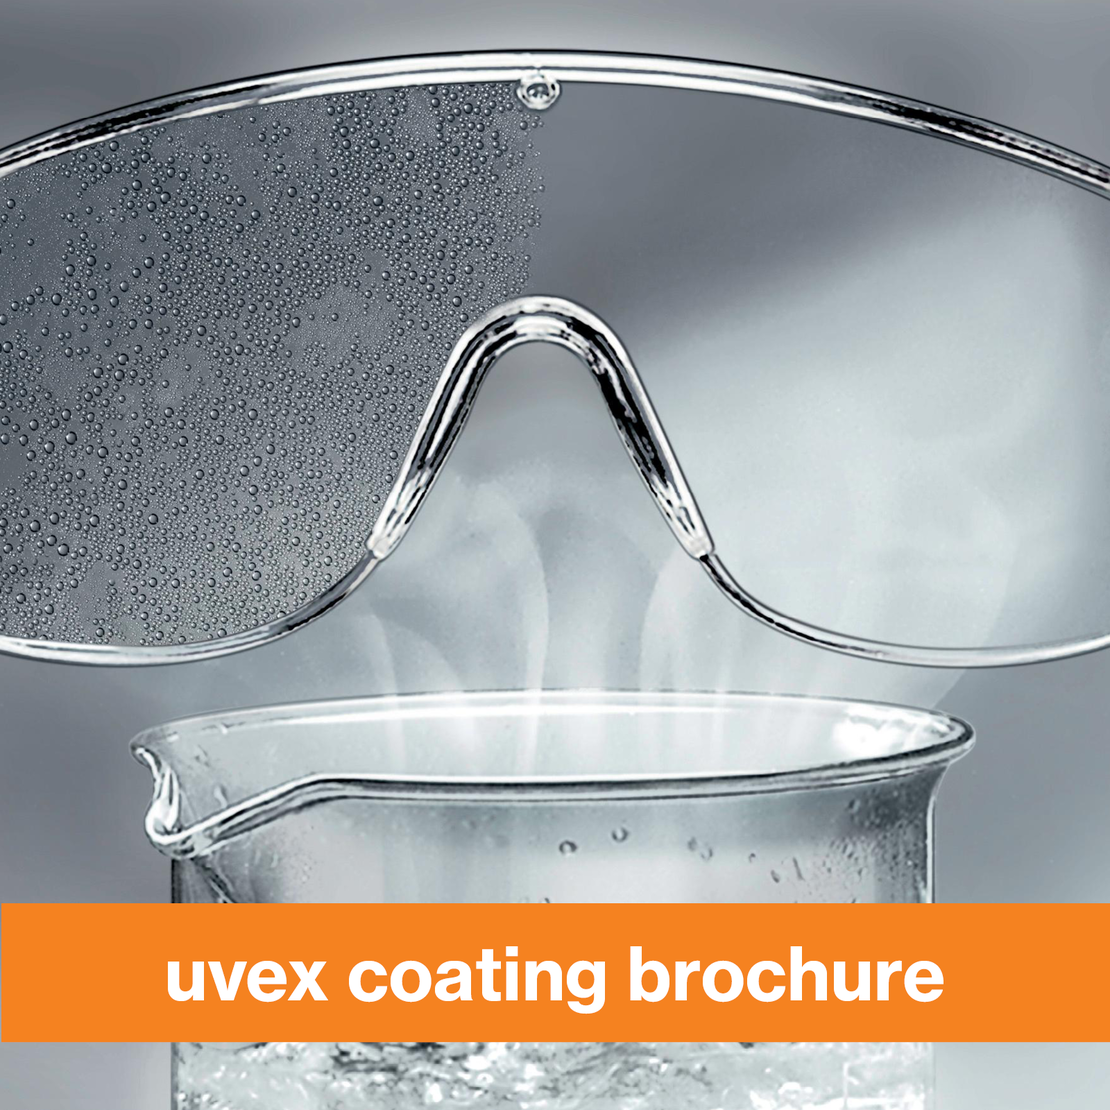 uvex coating flyer